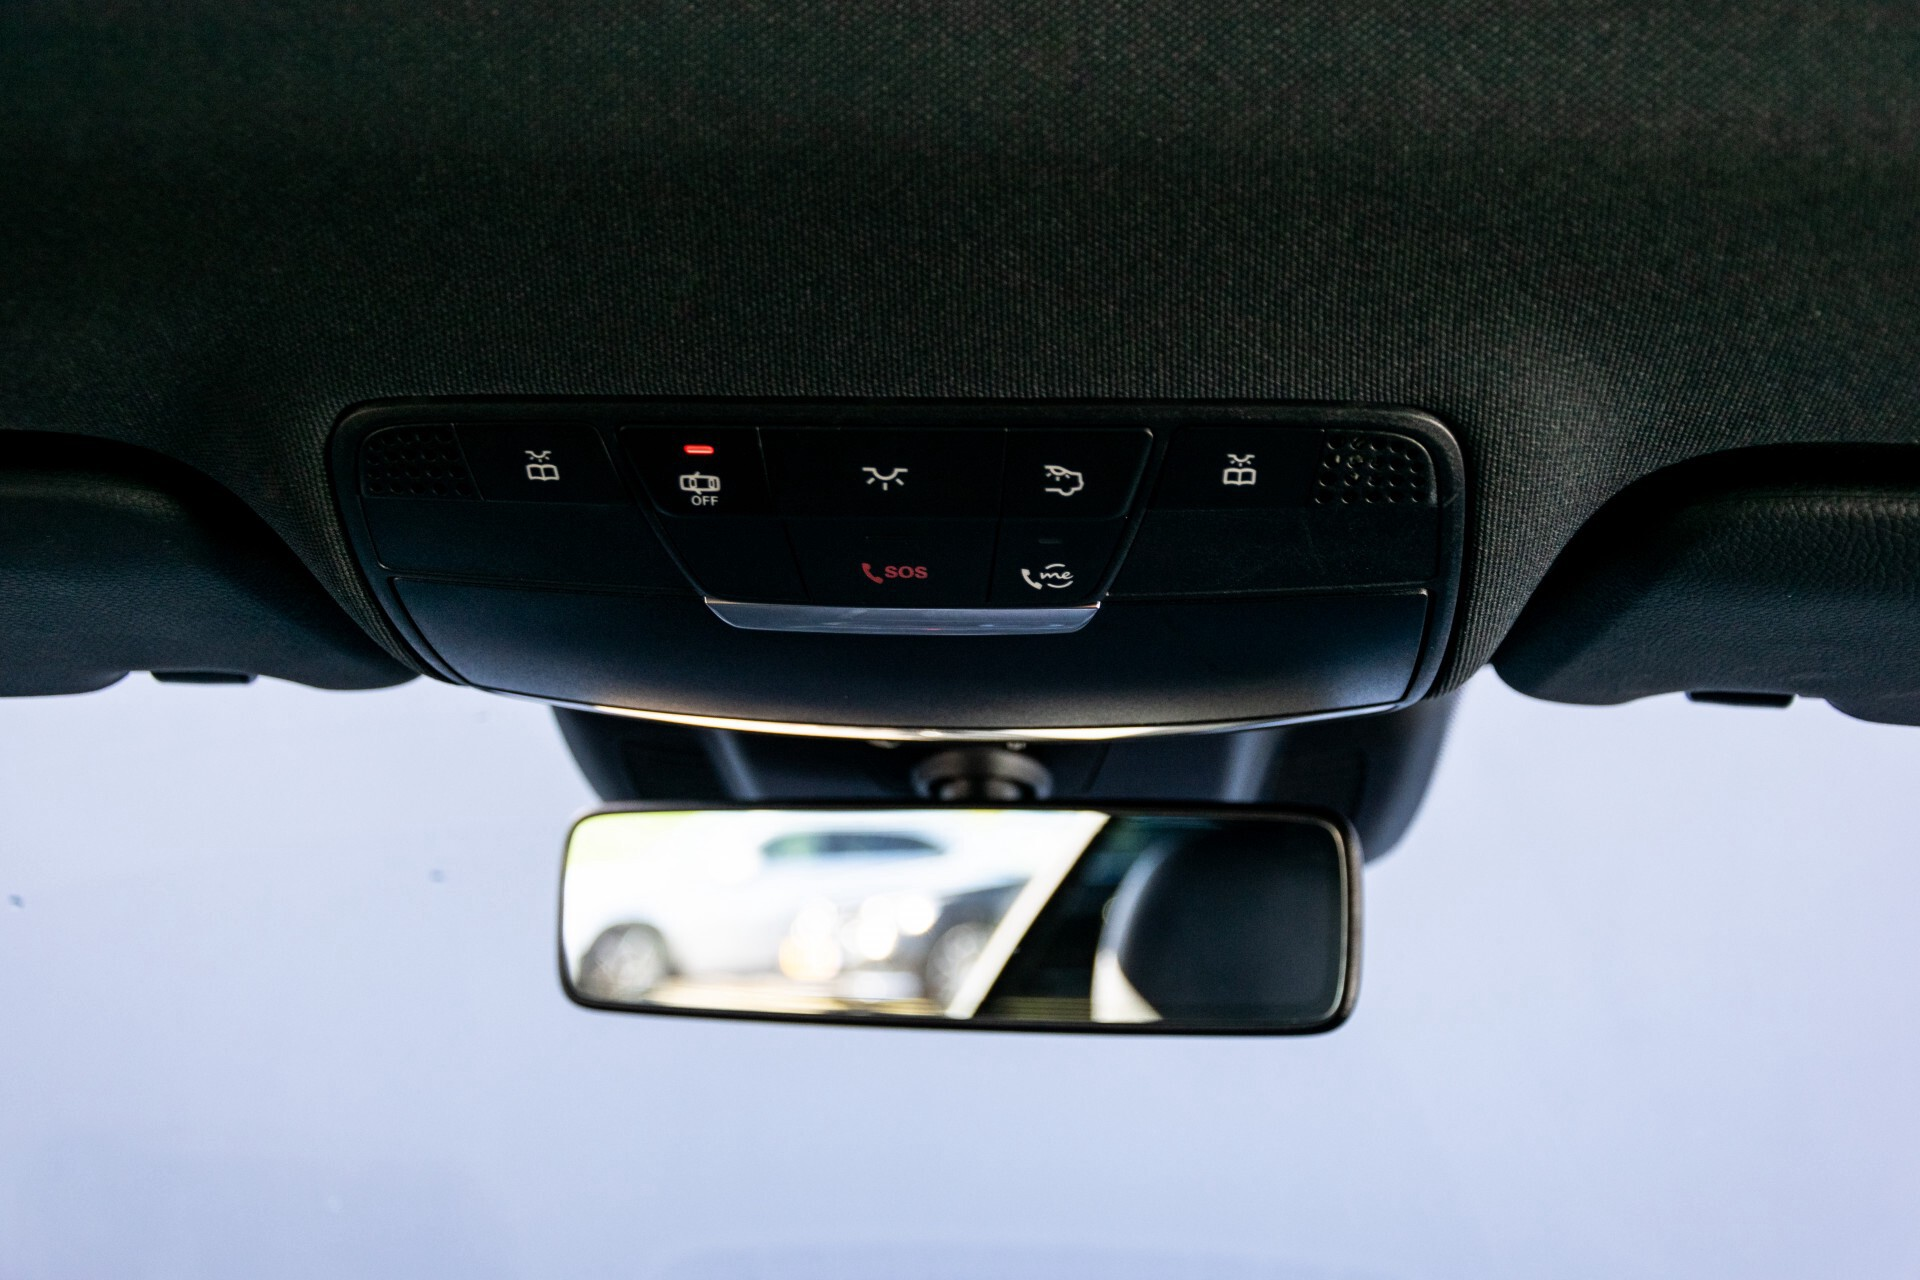 Mercedes-Benz E-Klasse Coupé 300 AMG Panorama/Rij-assist/Keyless/Massage/Memory/HUD/Standkachel/Night Aut9 Foto 50